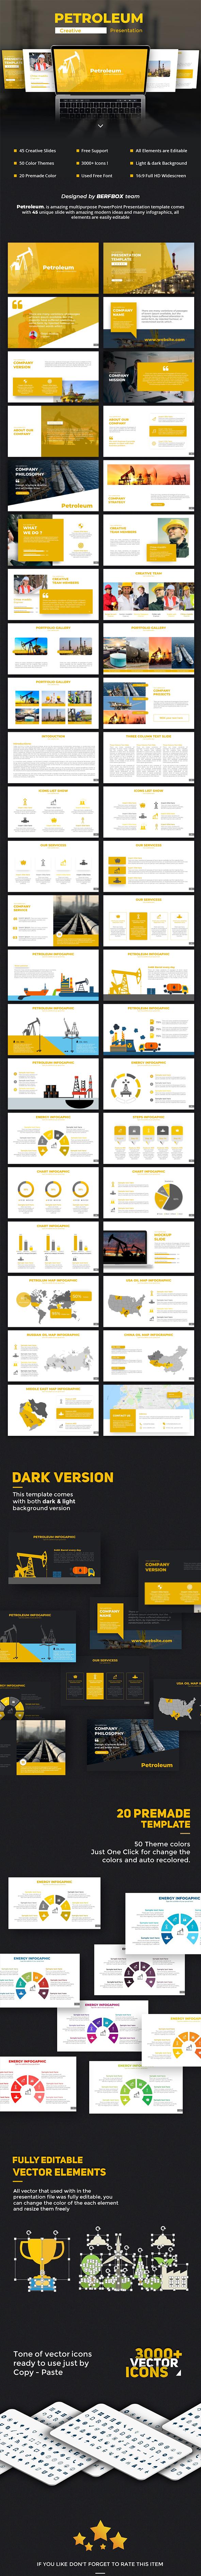 Petroleum PowerPoint Template - PowerPoint Templates Presentation Templates